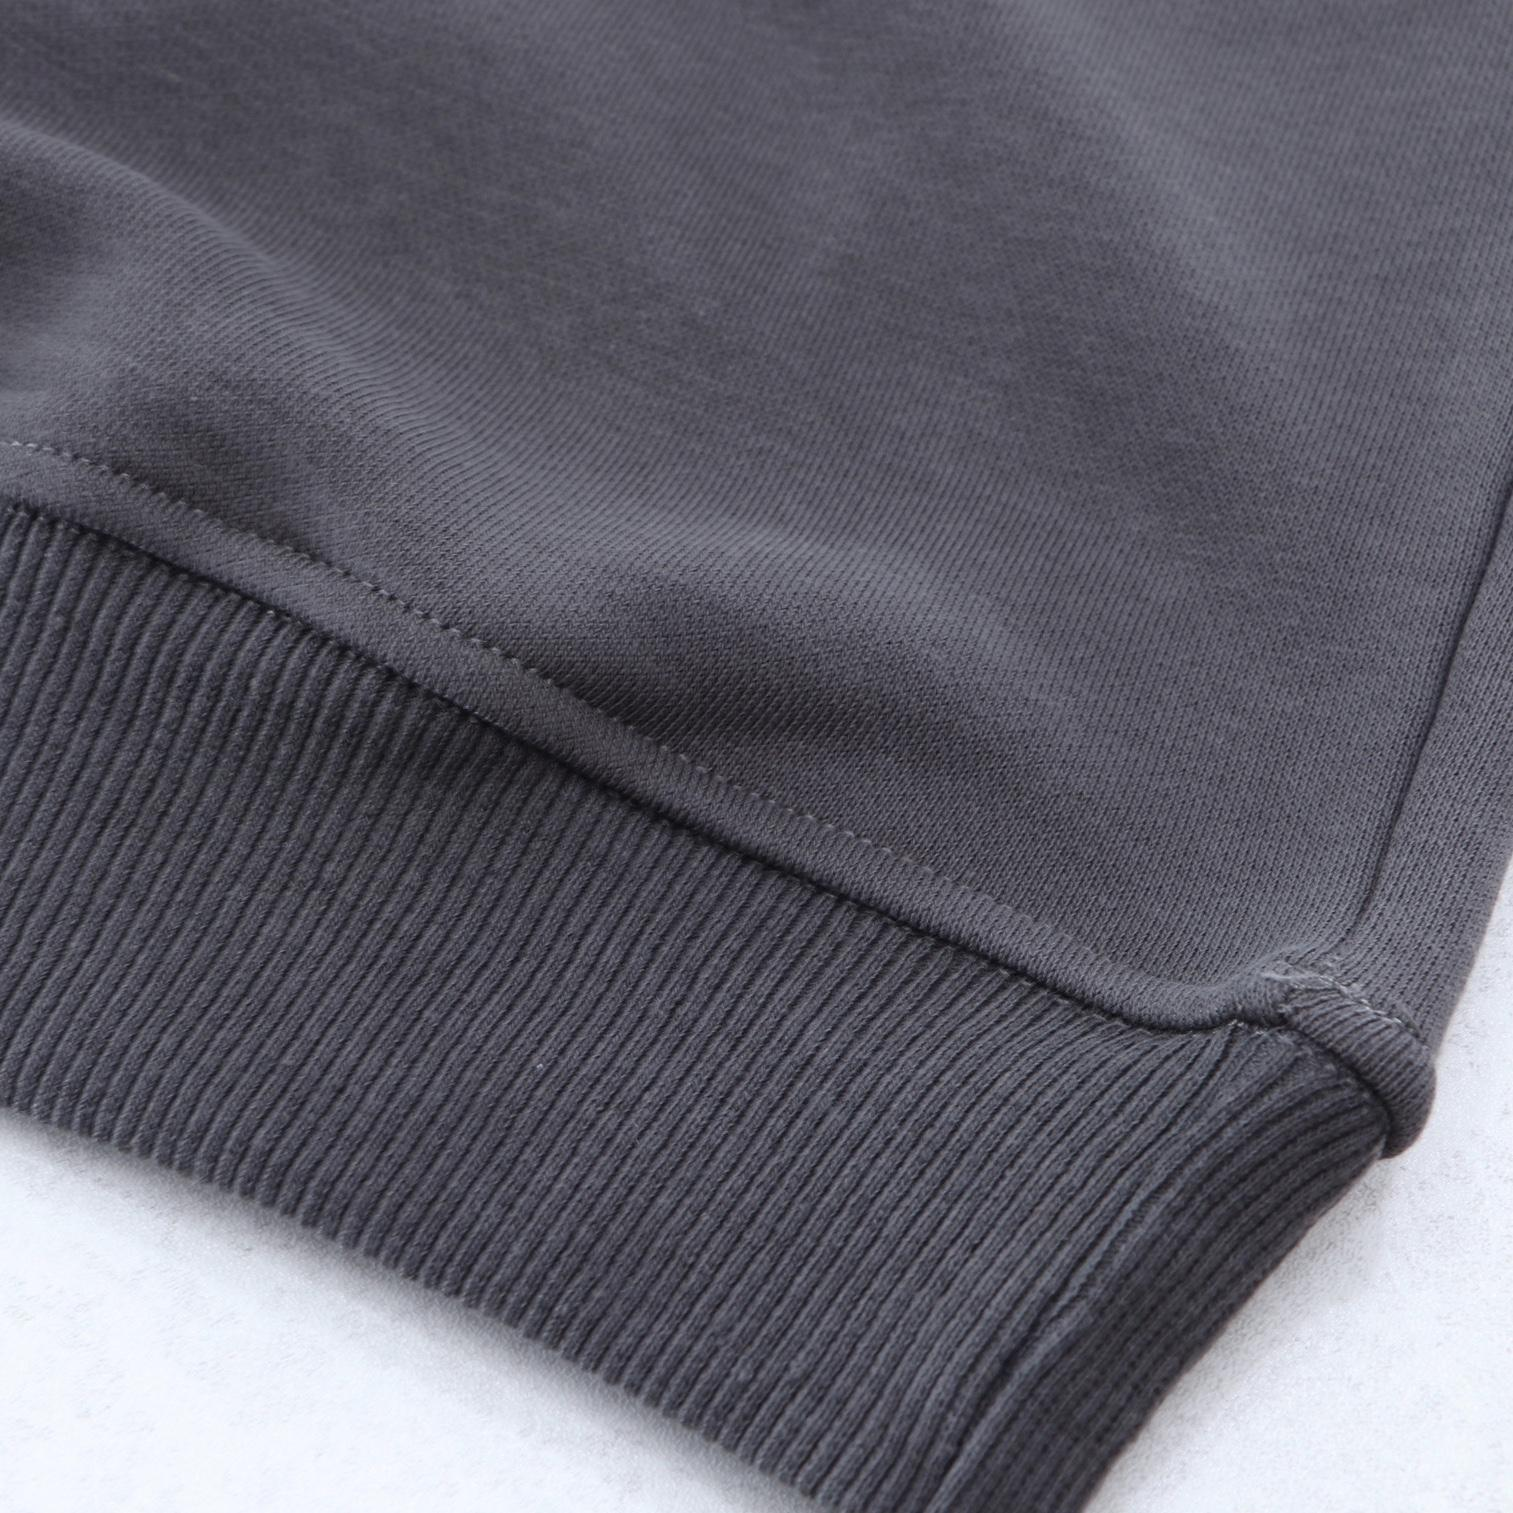 topstoney jumper 2020FW konng gonng Spring and autumn sweater mens fashion brand base coat fashion mens sportswear Basic style pocket